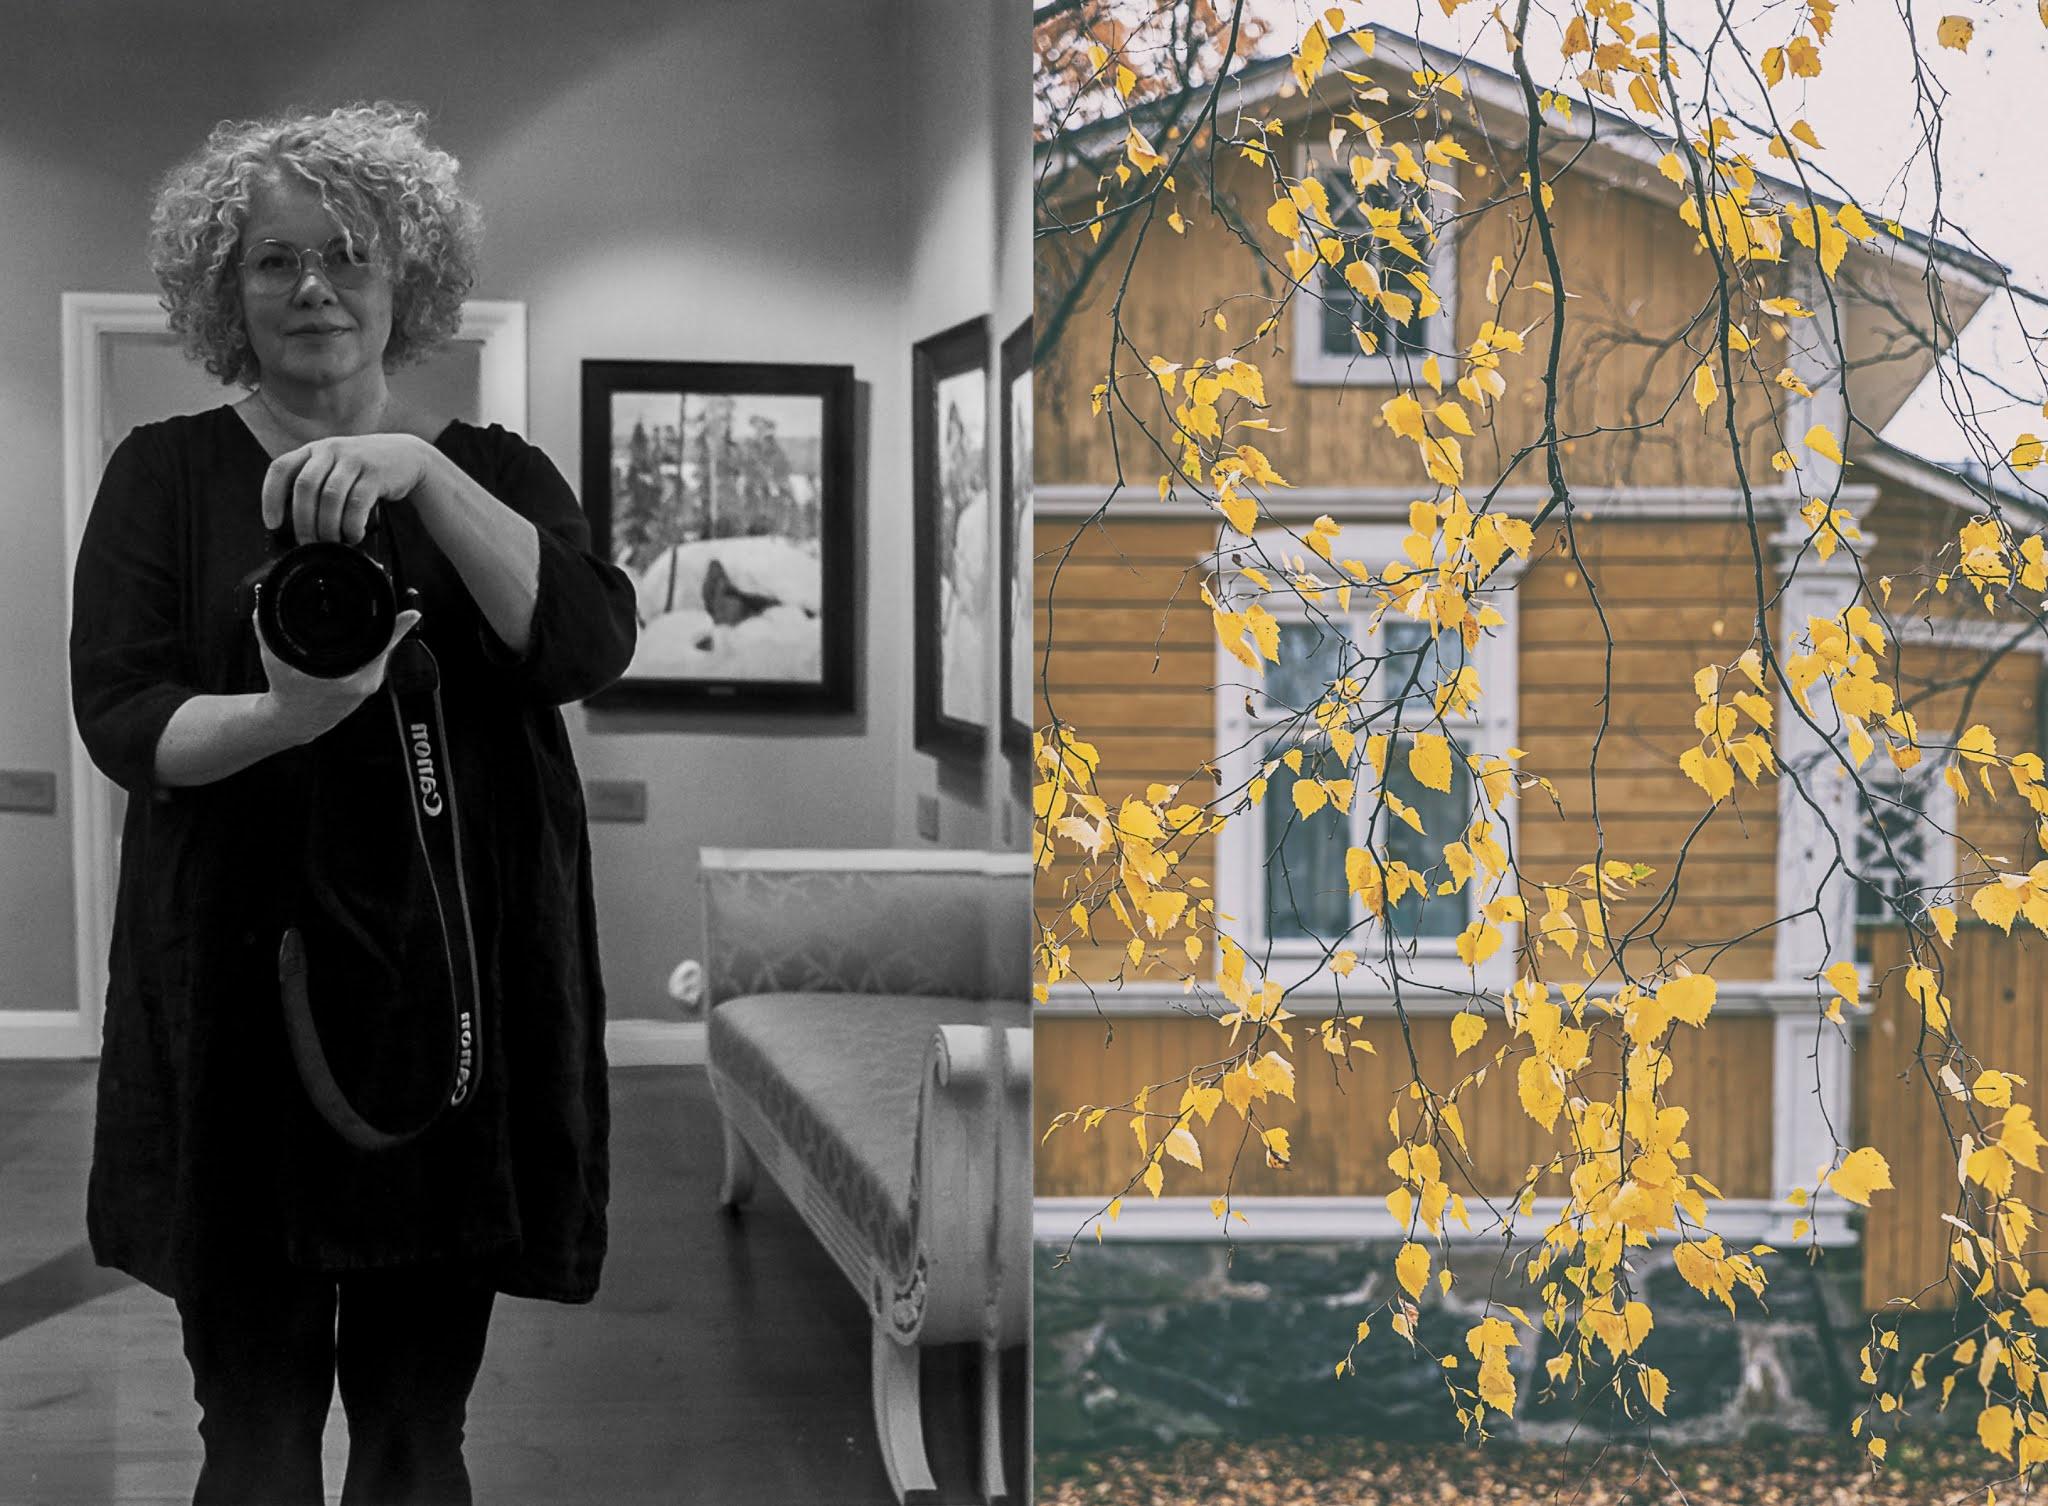 Rauma, Visitrauma, visitfinland, Finland, Satakunta, valokuvaaja, photographer, Frida Steiner, Visualaddict, Visualaddictfrida, blogi, valokuvausblogi, bloggaaja, Vanha kaupunki, Old town